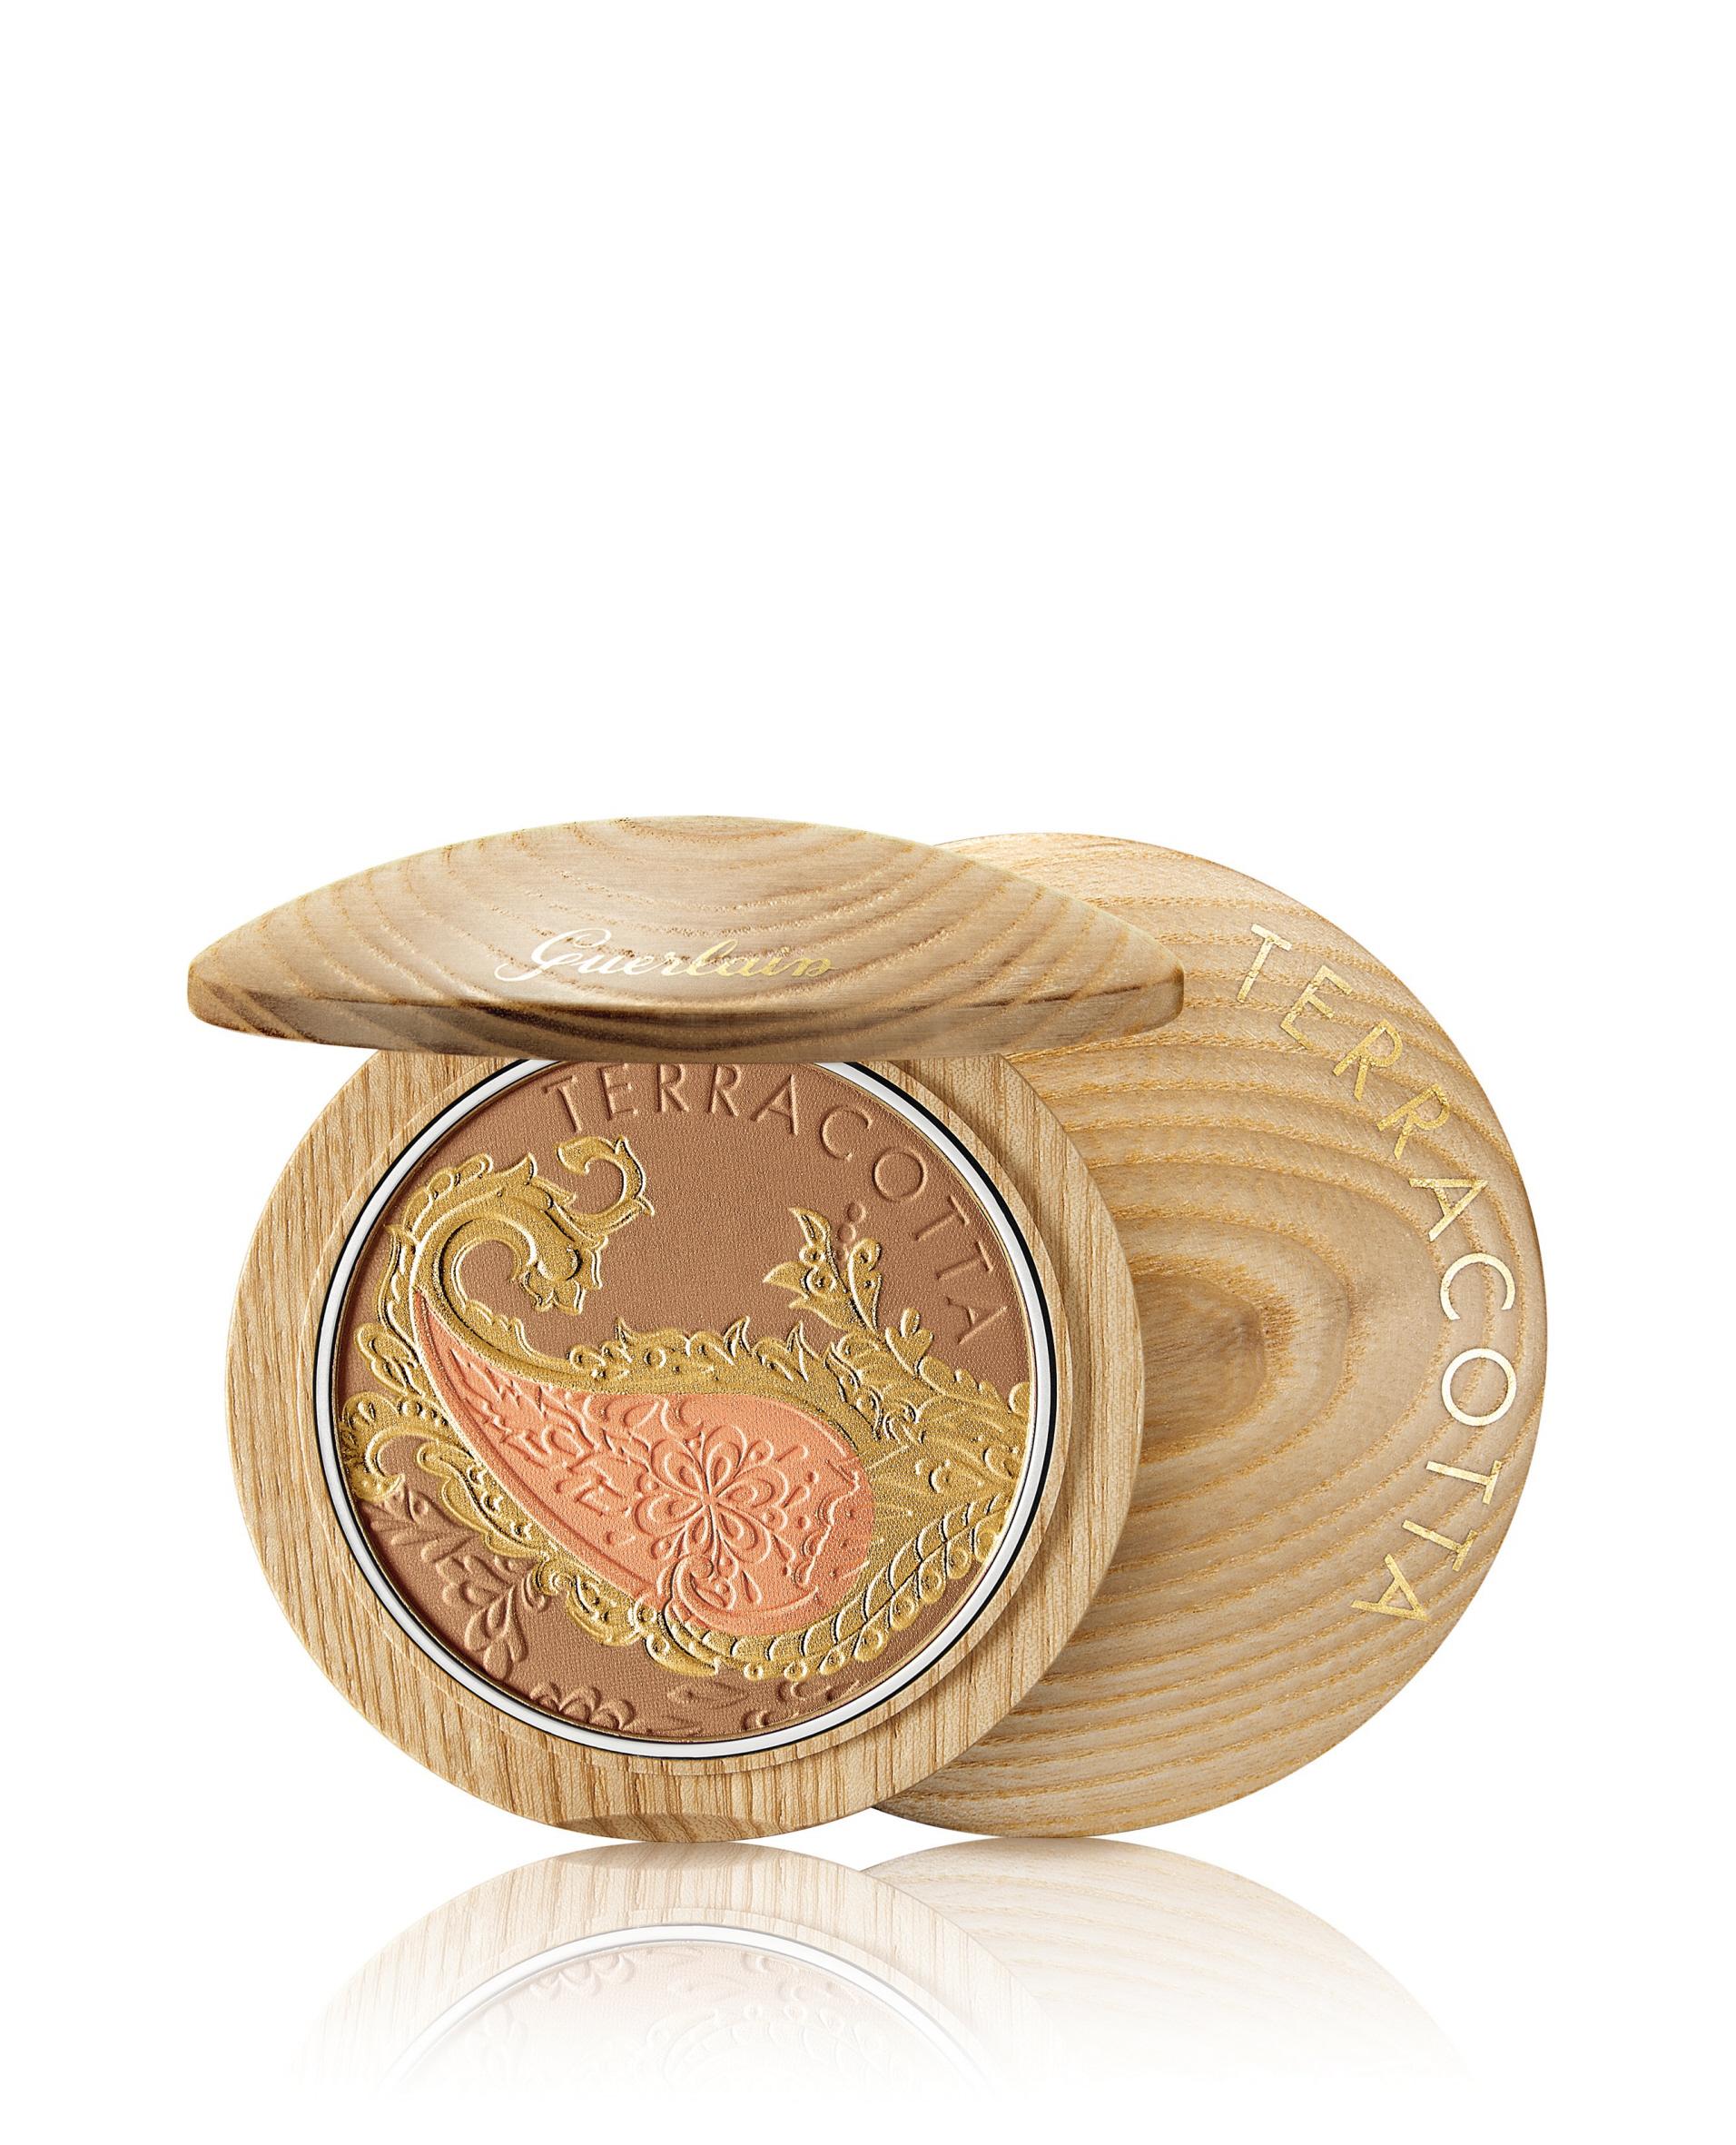 Terracotta Route Des Indes Tan Enhanzing Bronzer and Blush